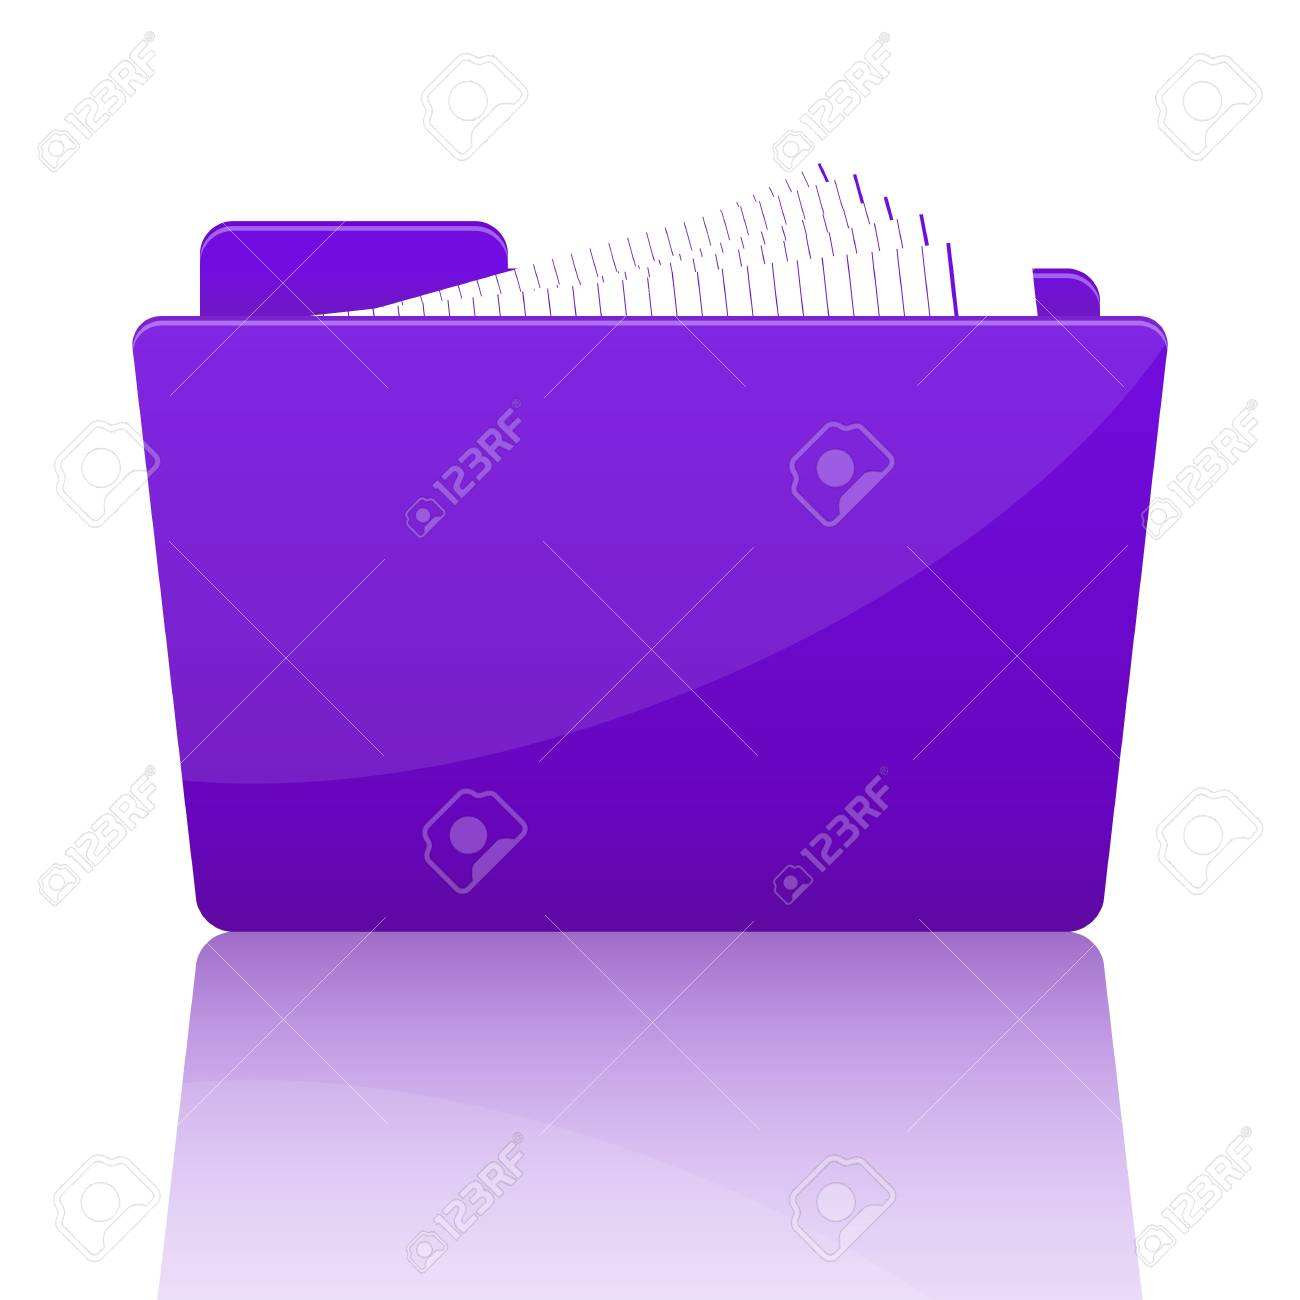 Purple file folder with paper, vector illustration Stock Vector - 18989994